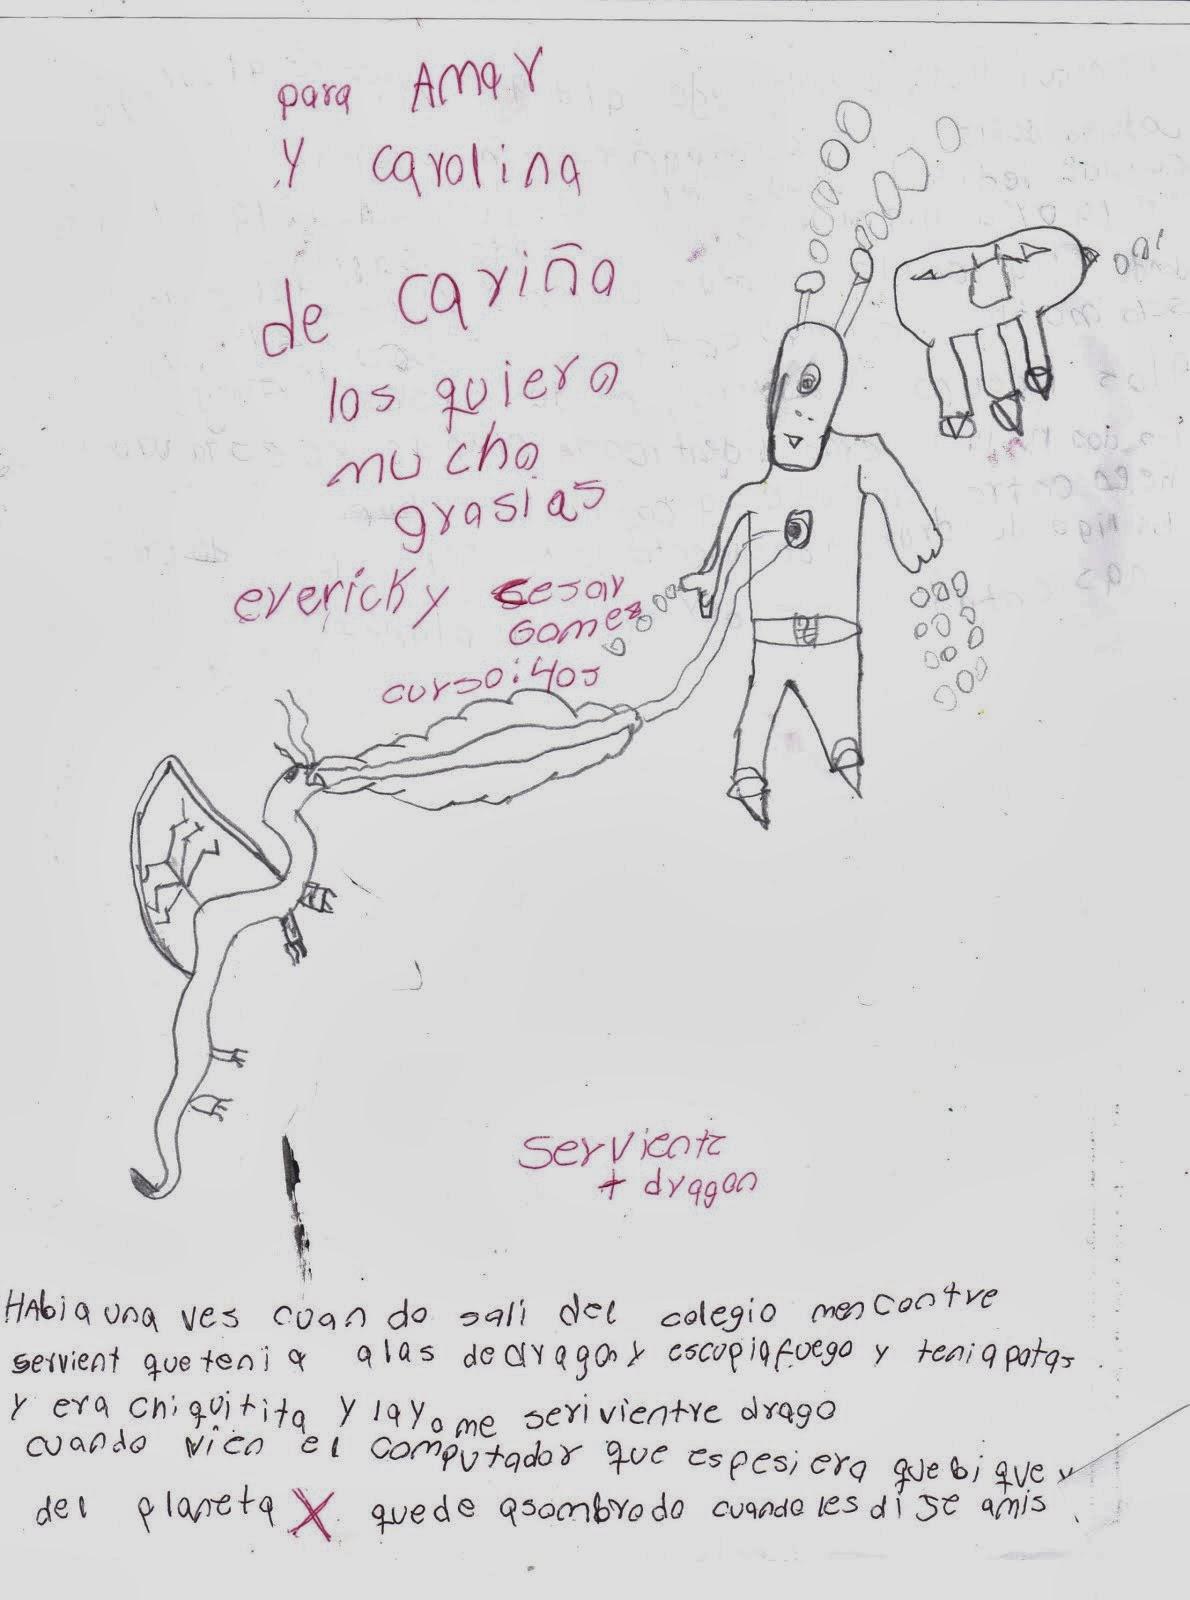 Regalitos, Dibujillos Dibujitos Extraordinarios!!